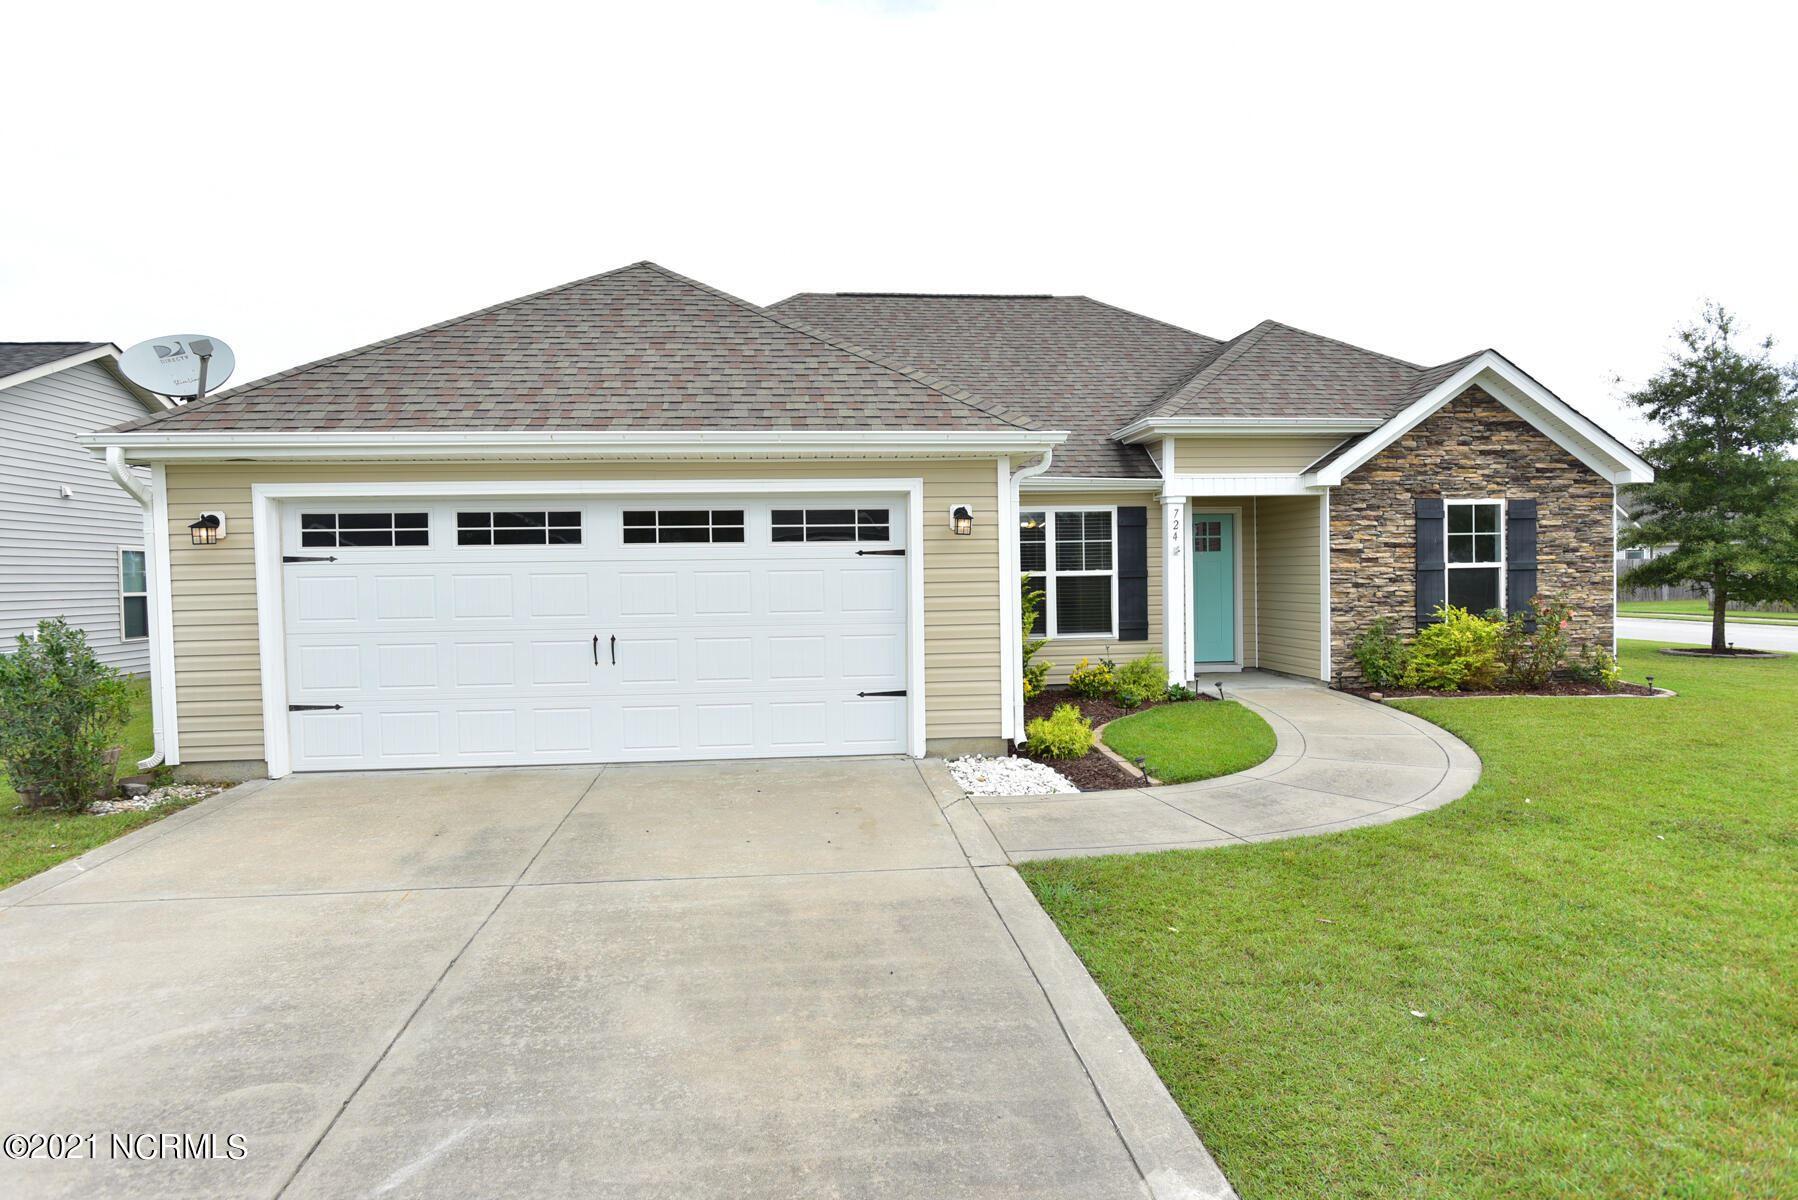 Photo of 724 Radiant Drive, Jacksonville, NC 28546 (MLS # 100295012)